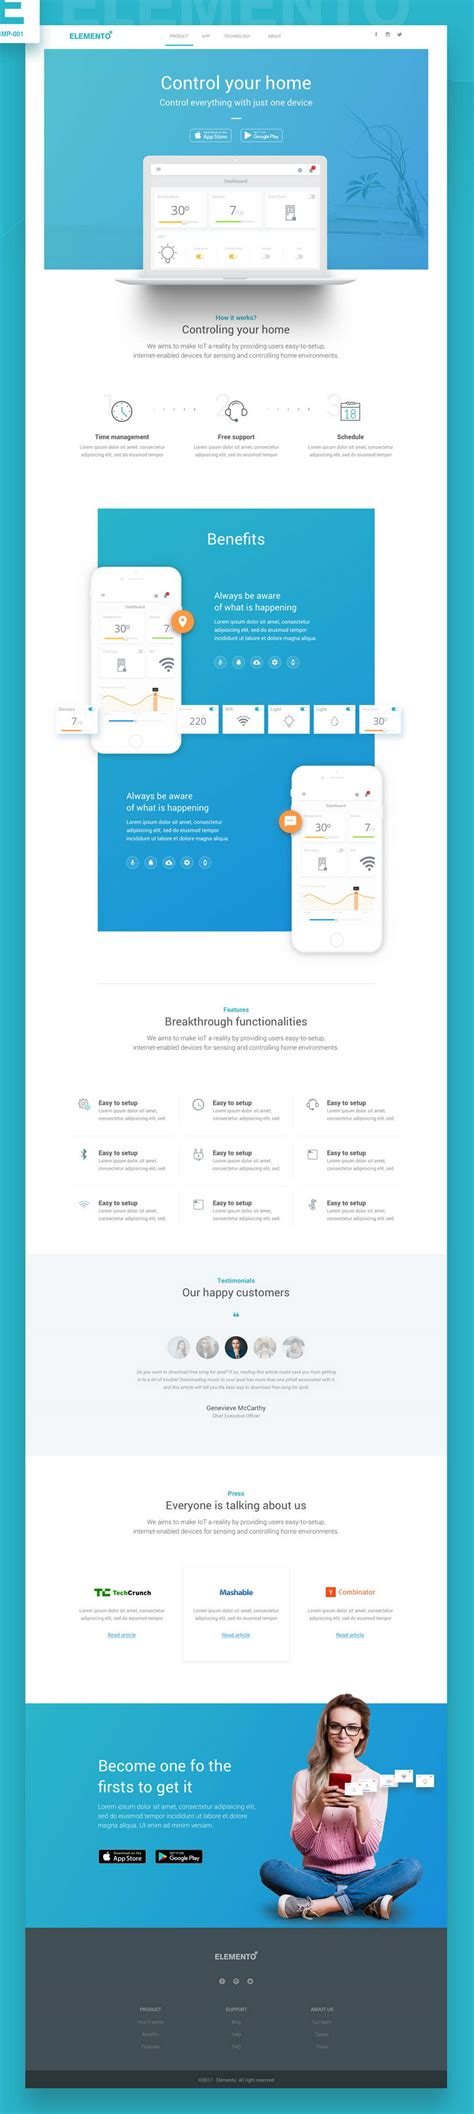 Elemento Startup Web Template Pinspiry Startup Website Template Free